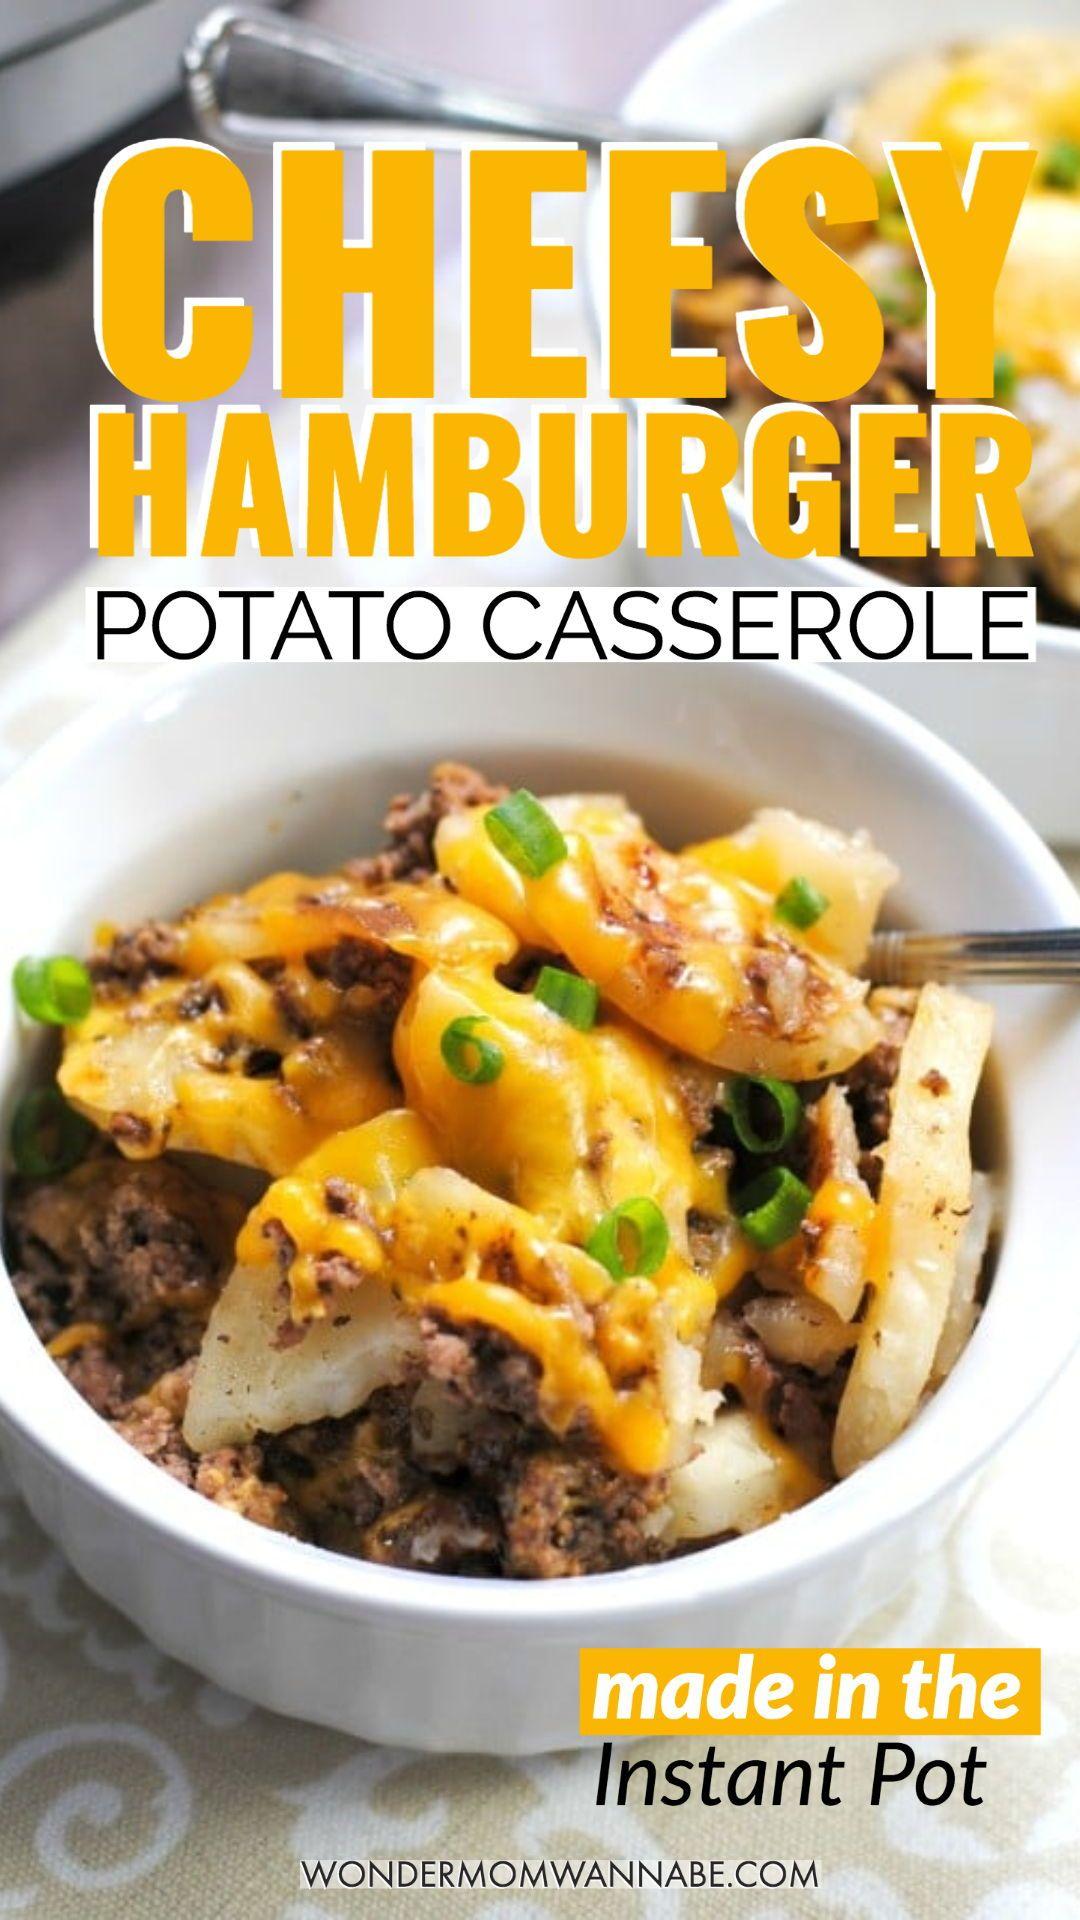 Instant Pot Cheesy Hamburger Potato Casserole In 2020 Instant Pot Dinner Recipes Pot Recipes Healthy Ground Beef Recipes Easy